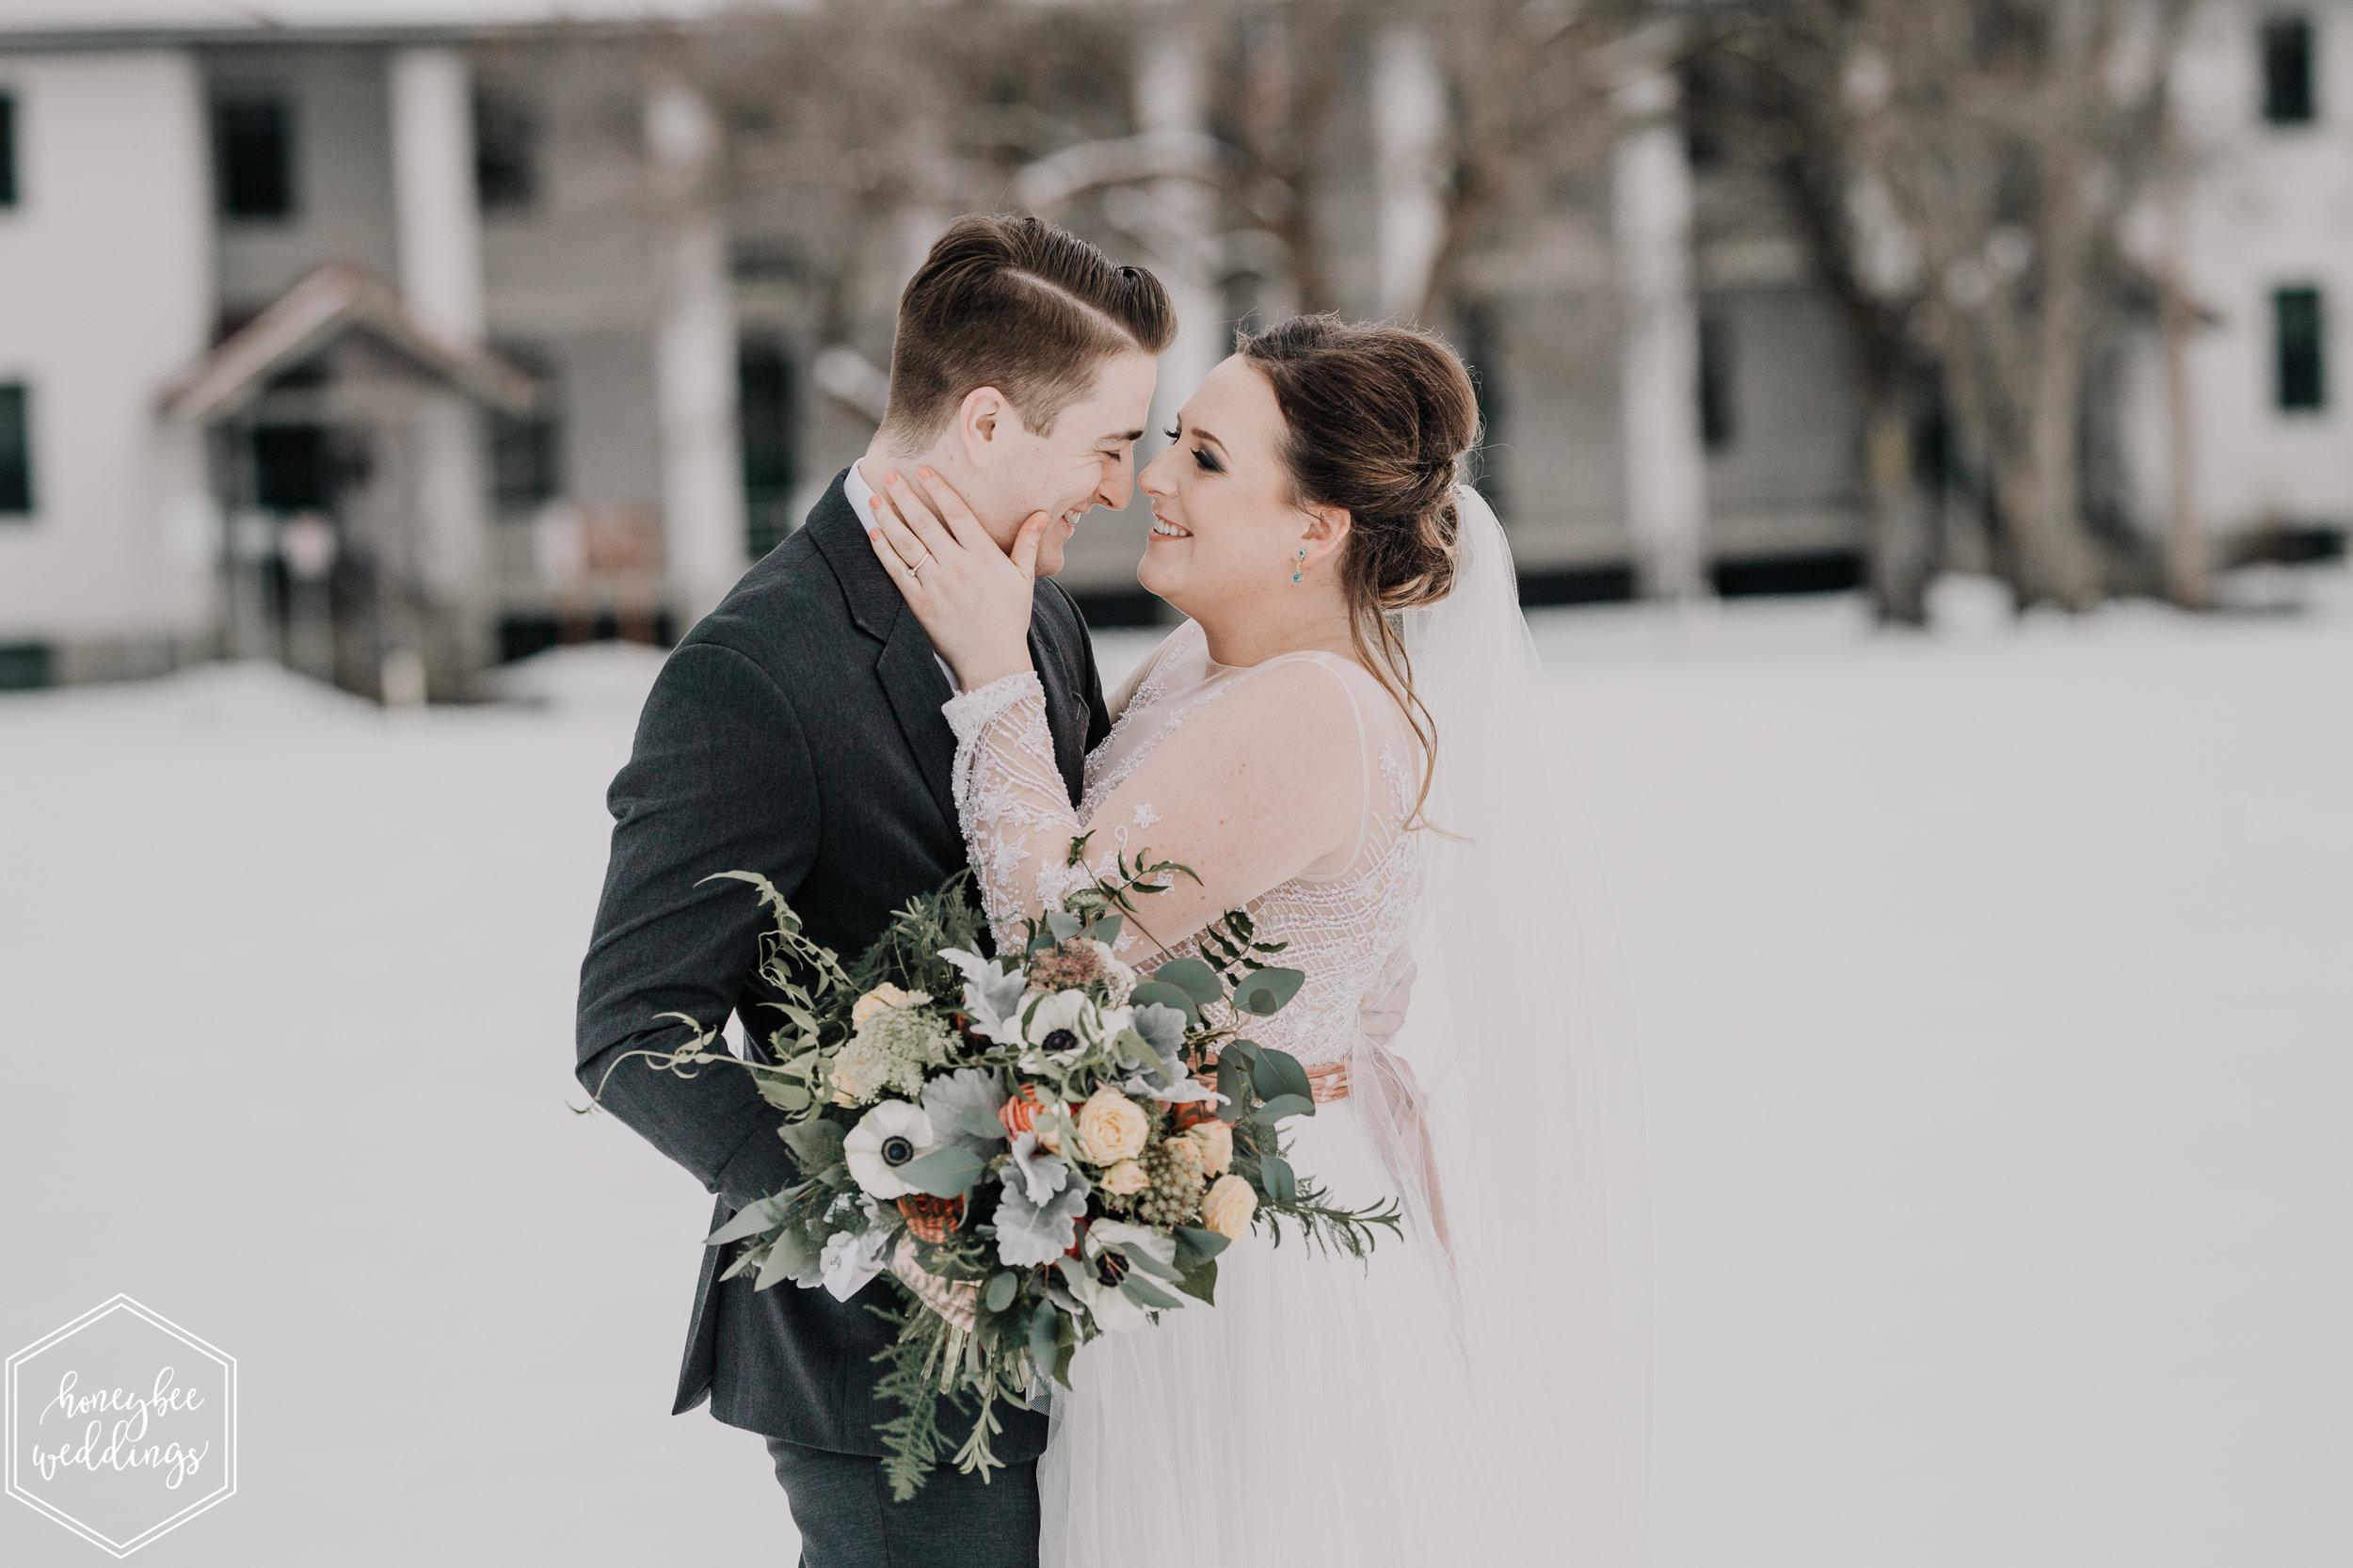 0108Montana Wedding Photographer_Montana winter wedding_Wedding at Fort Missoula_Meri & Carter_December 31, 2015-585.jpg